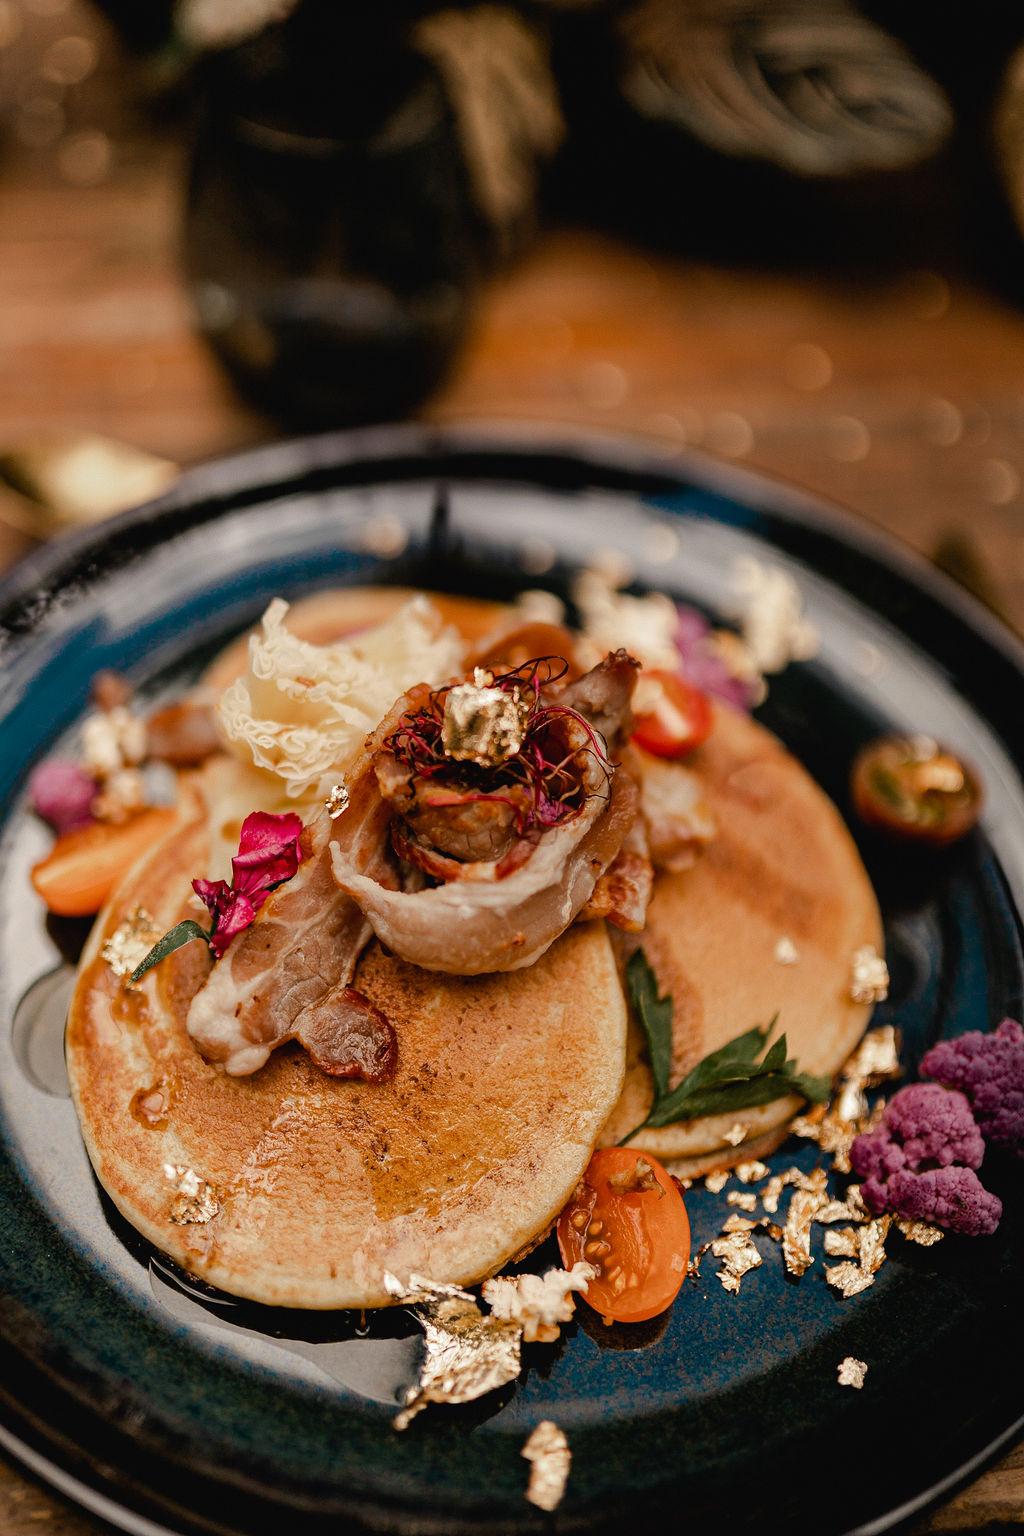 wedding pancakes - gourmet pancakes - unique wedding desserts - wedding dessert table